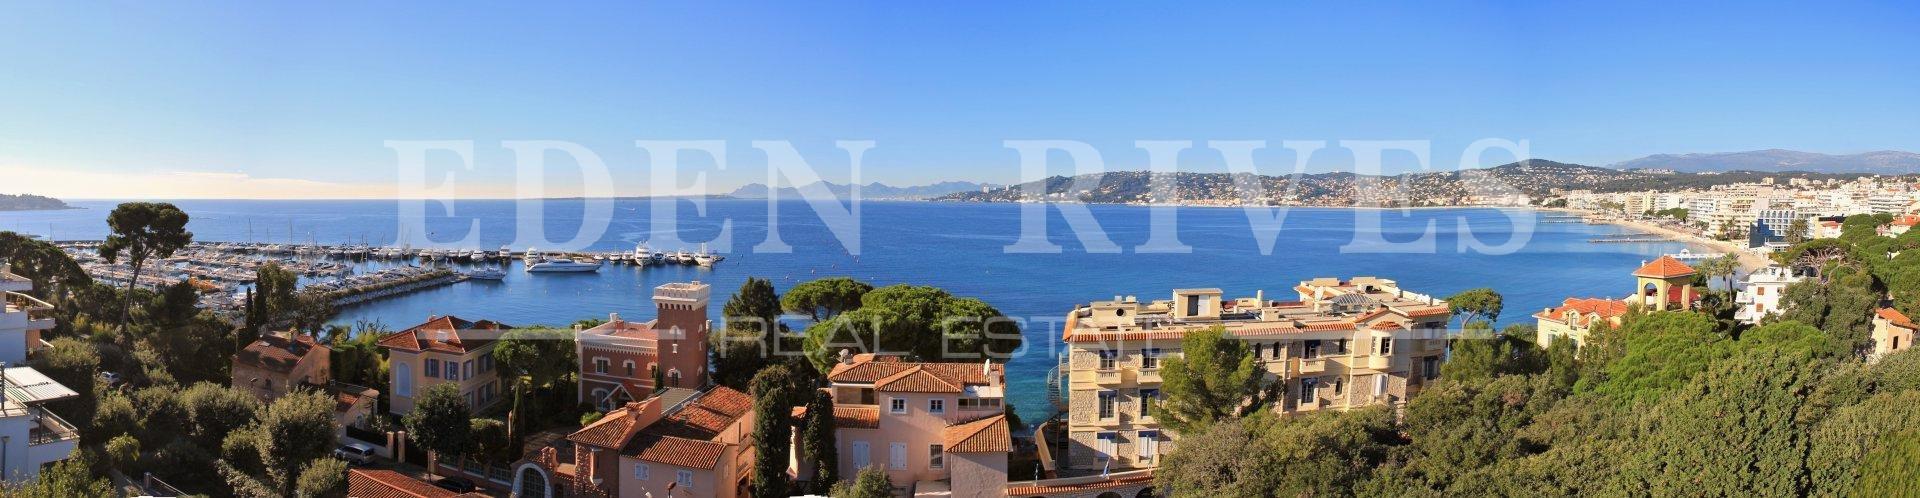 Sale Penthouse - Cap d'Antibes